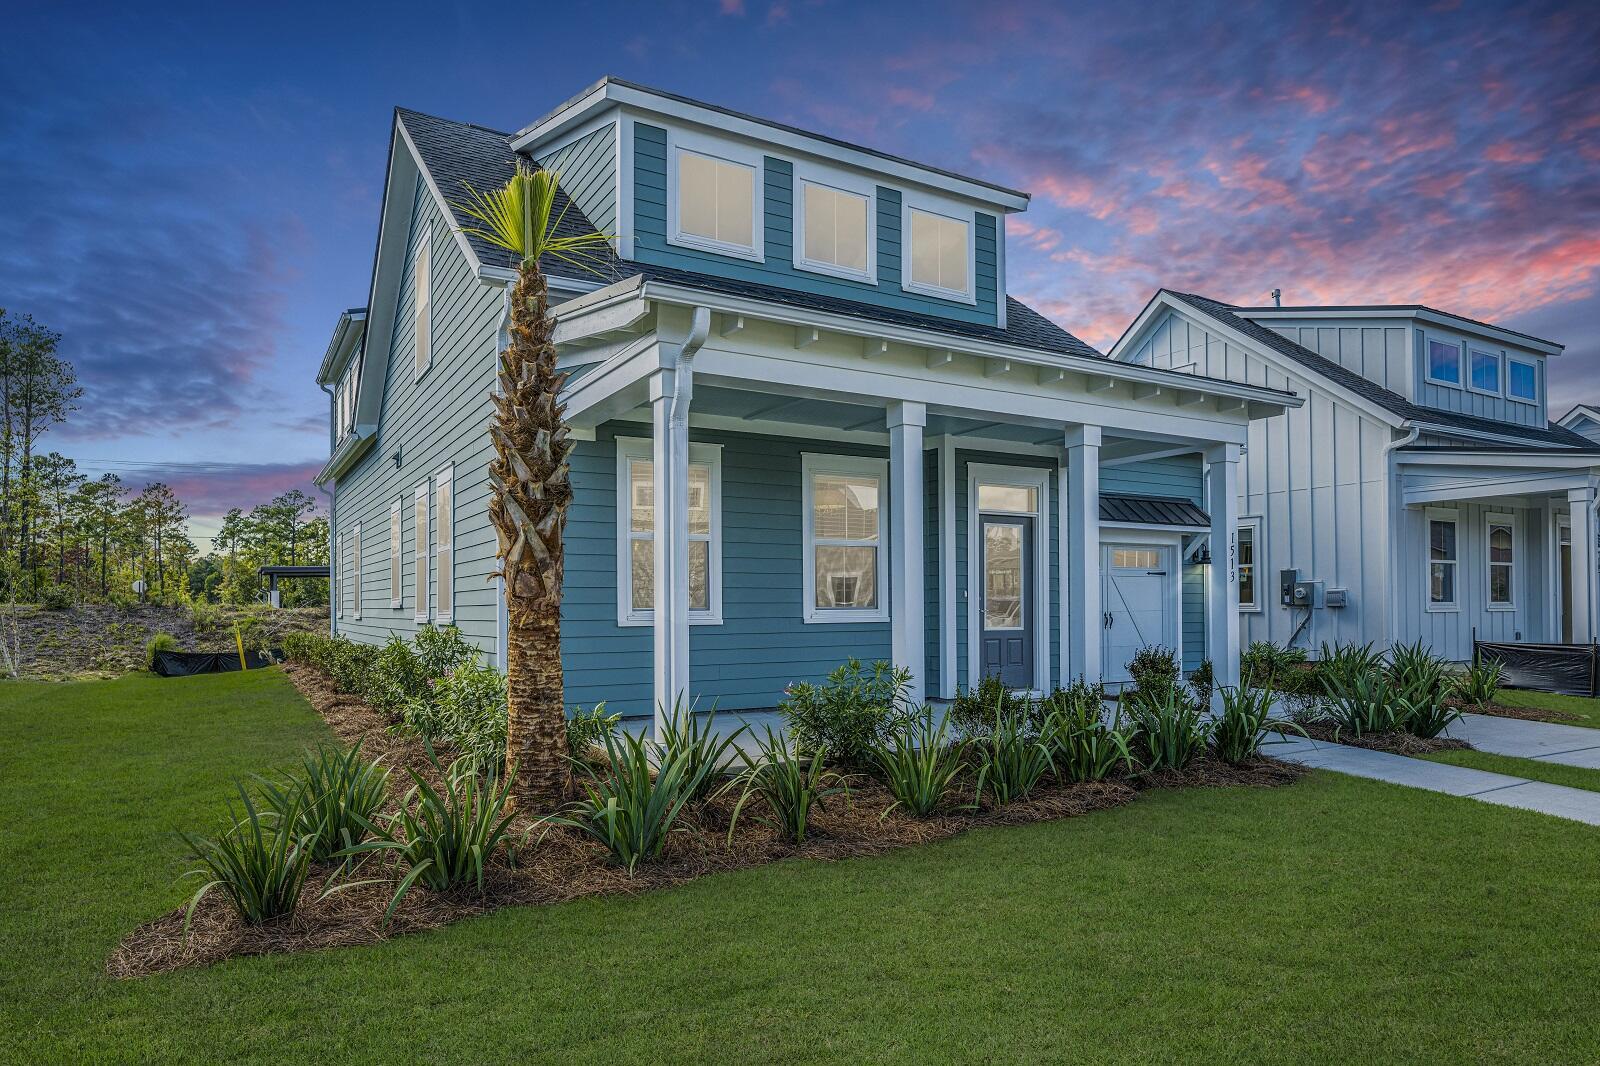 1519 Pogonia Street, Mount Pleasant, 29466, 2 Bedrooms Bedrooms, ,2 BathroomsBathrooms,For Sale,Pogonia Street,21027985